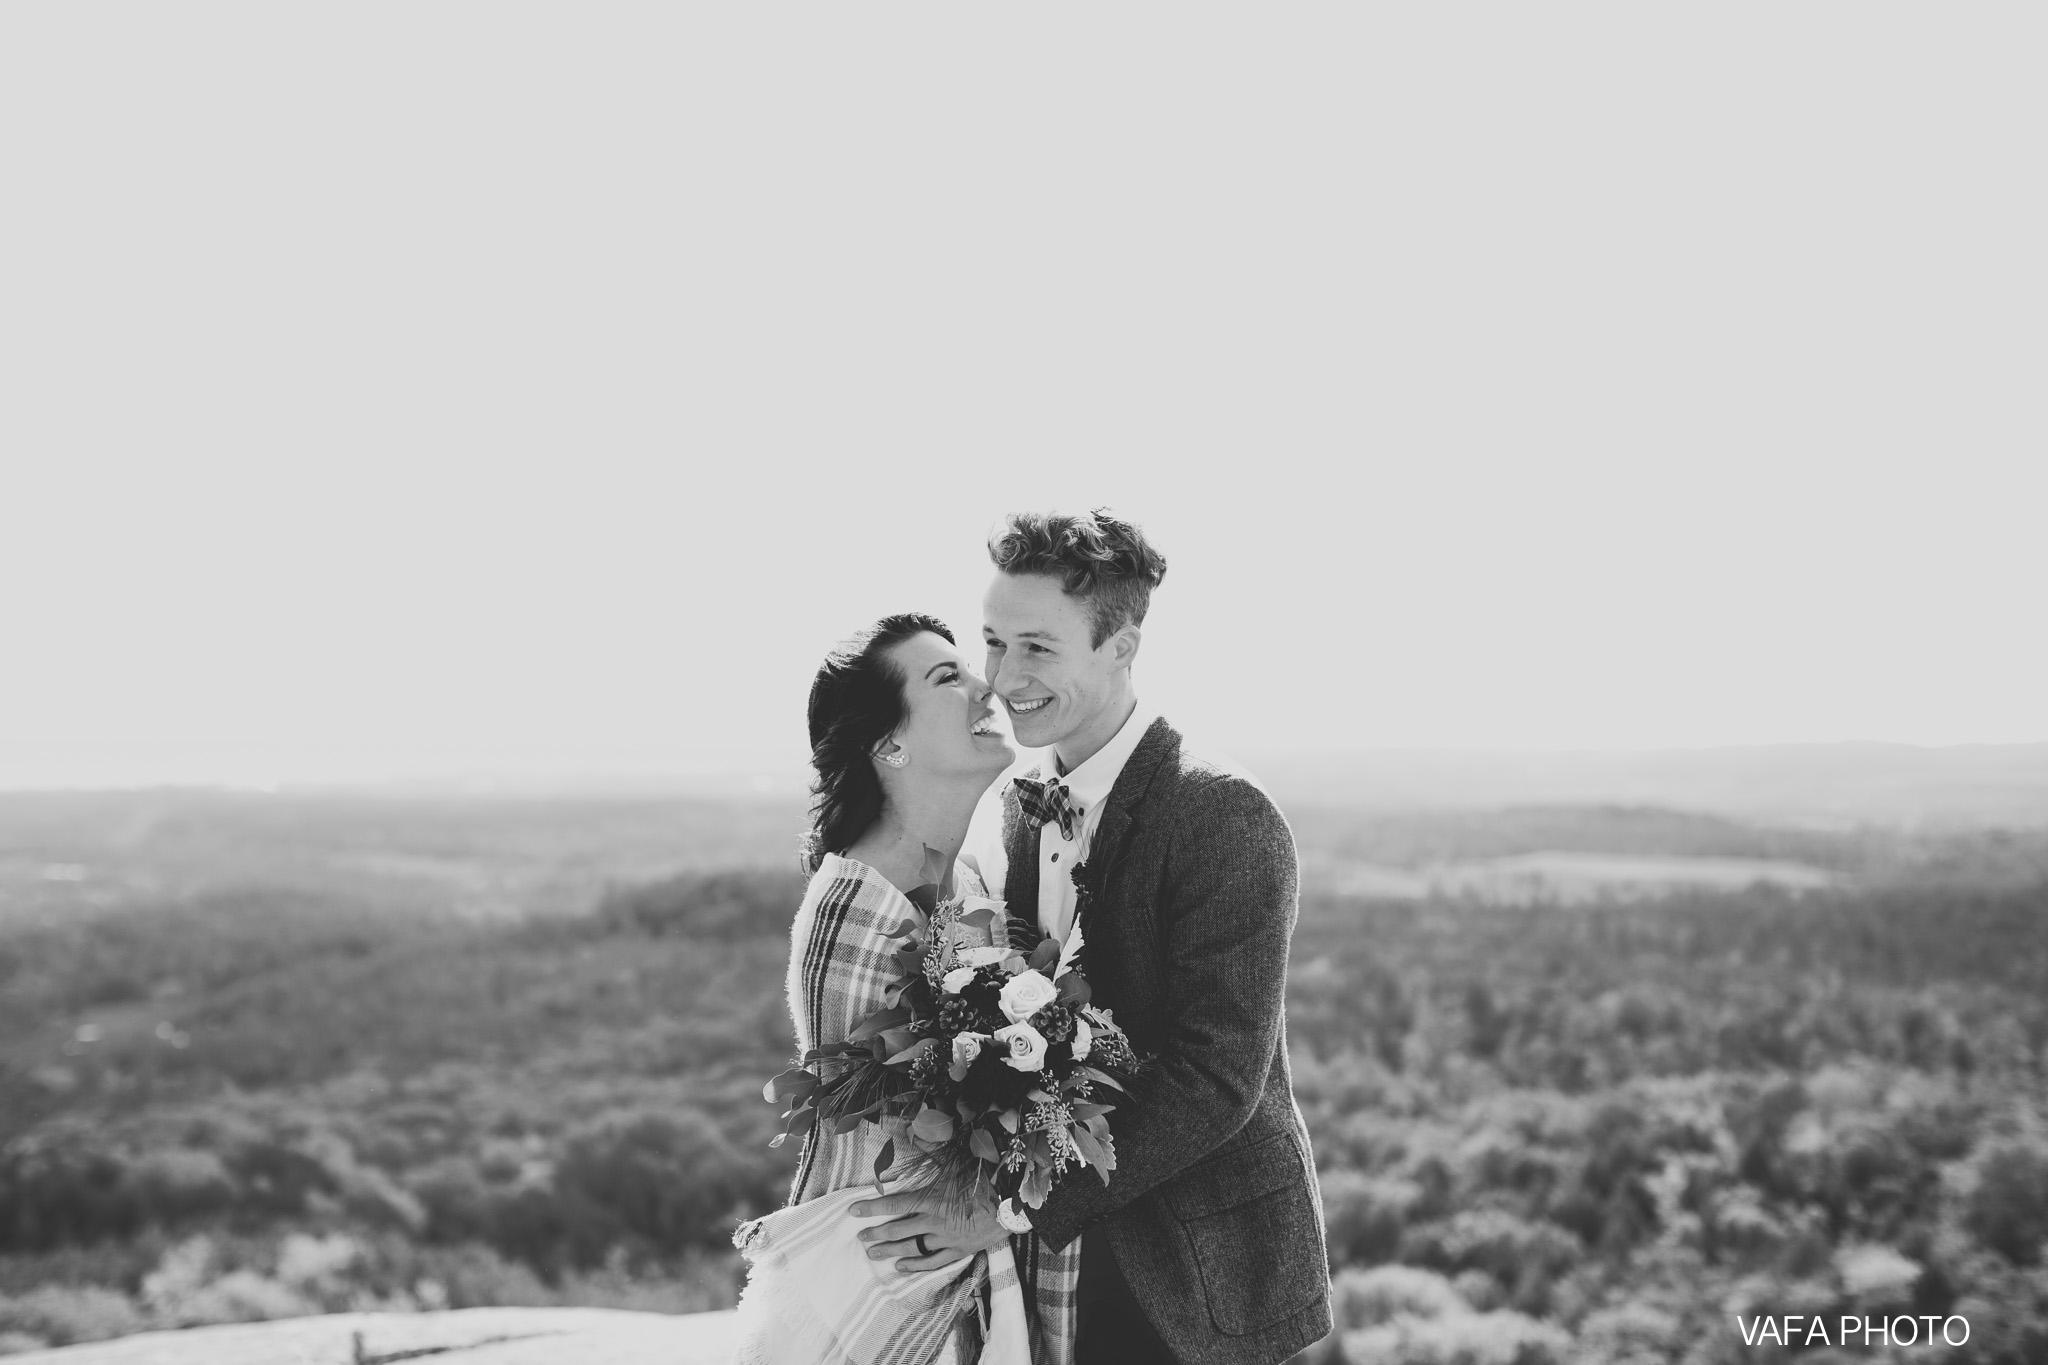 Hogback-Mountain-Wedding-Chelsea-Josh-Vafa-Photo-418.jpg